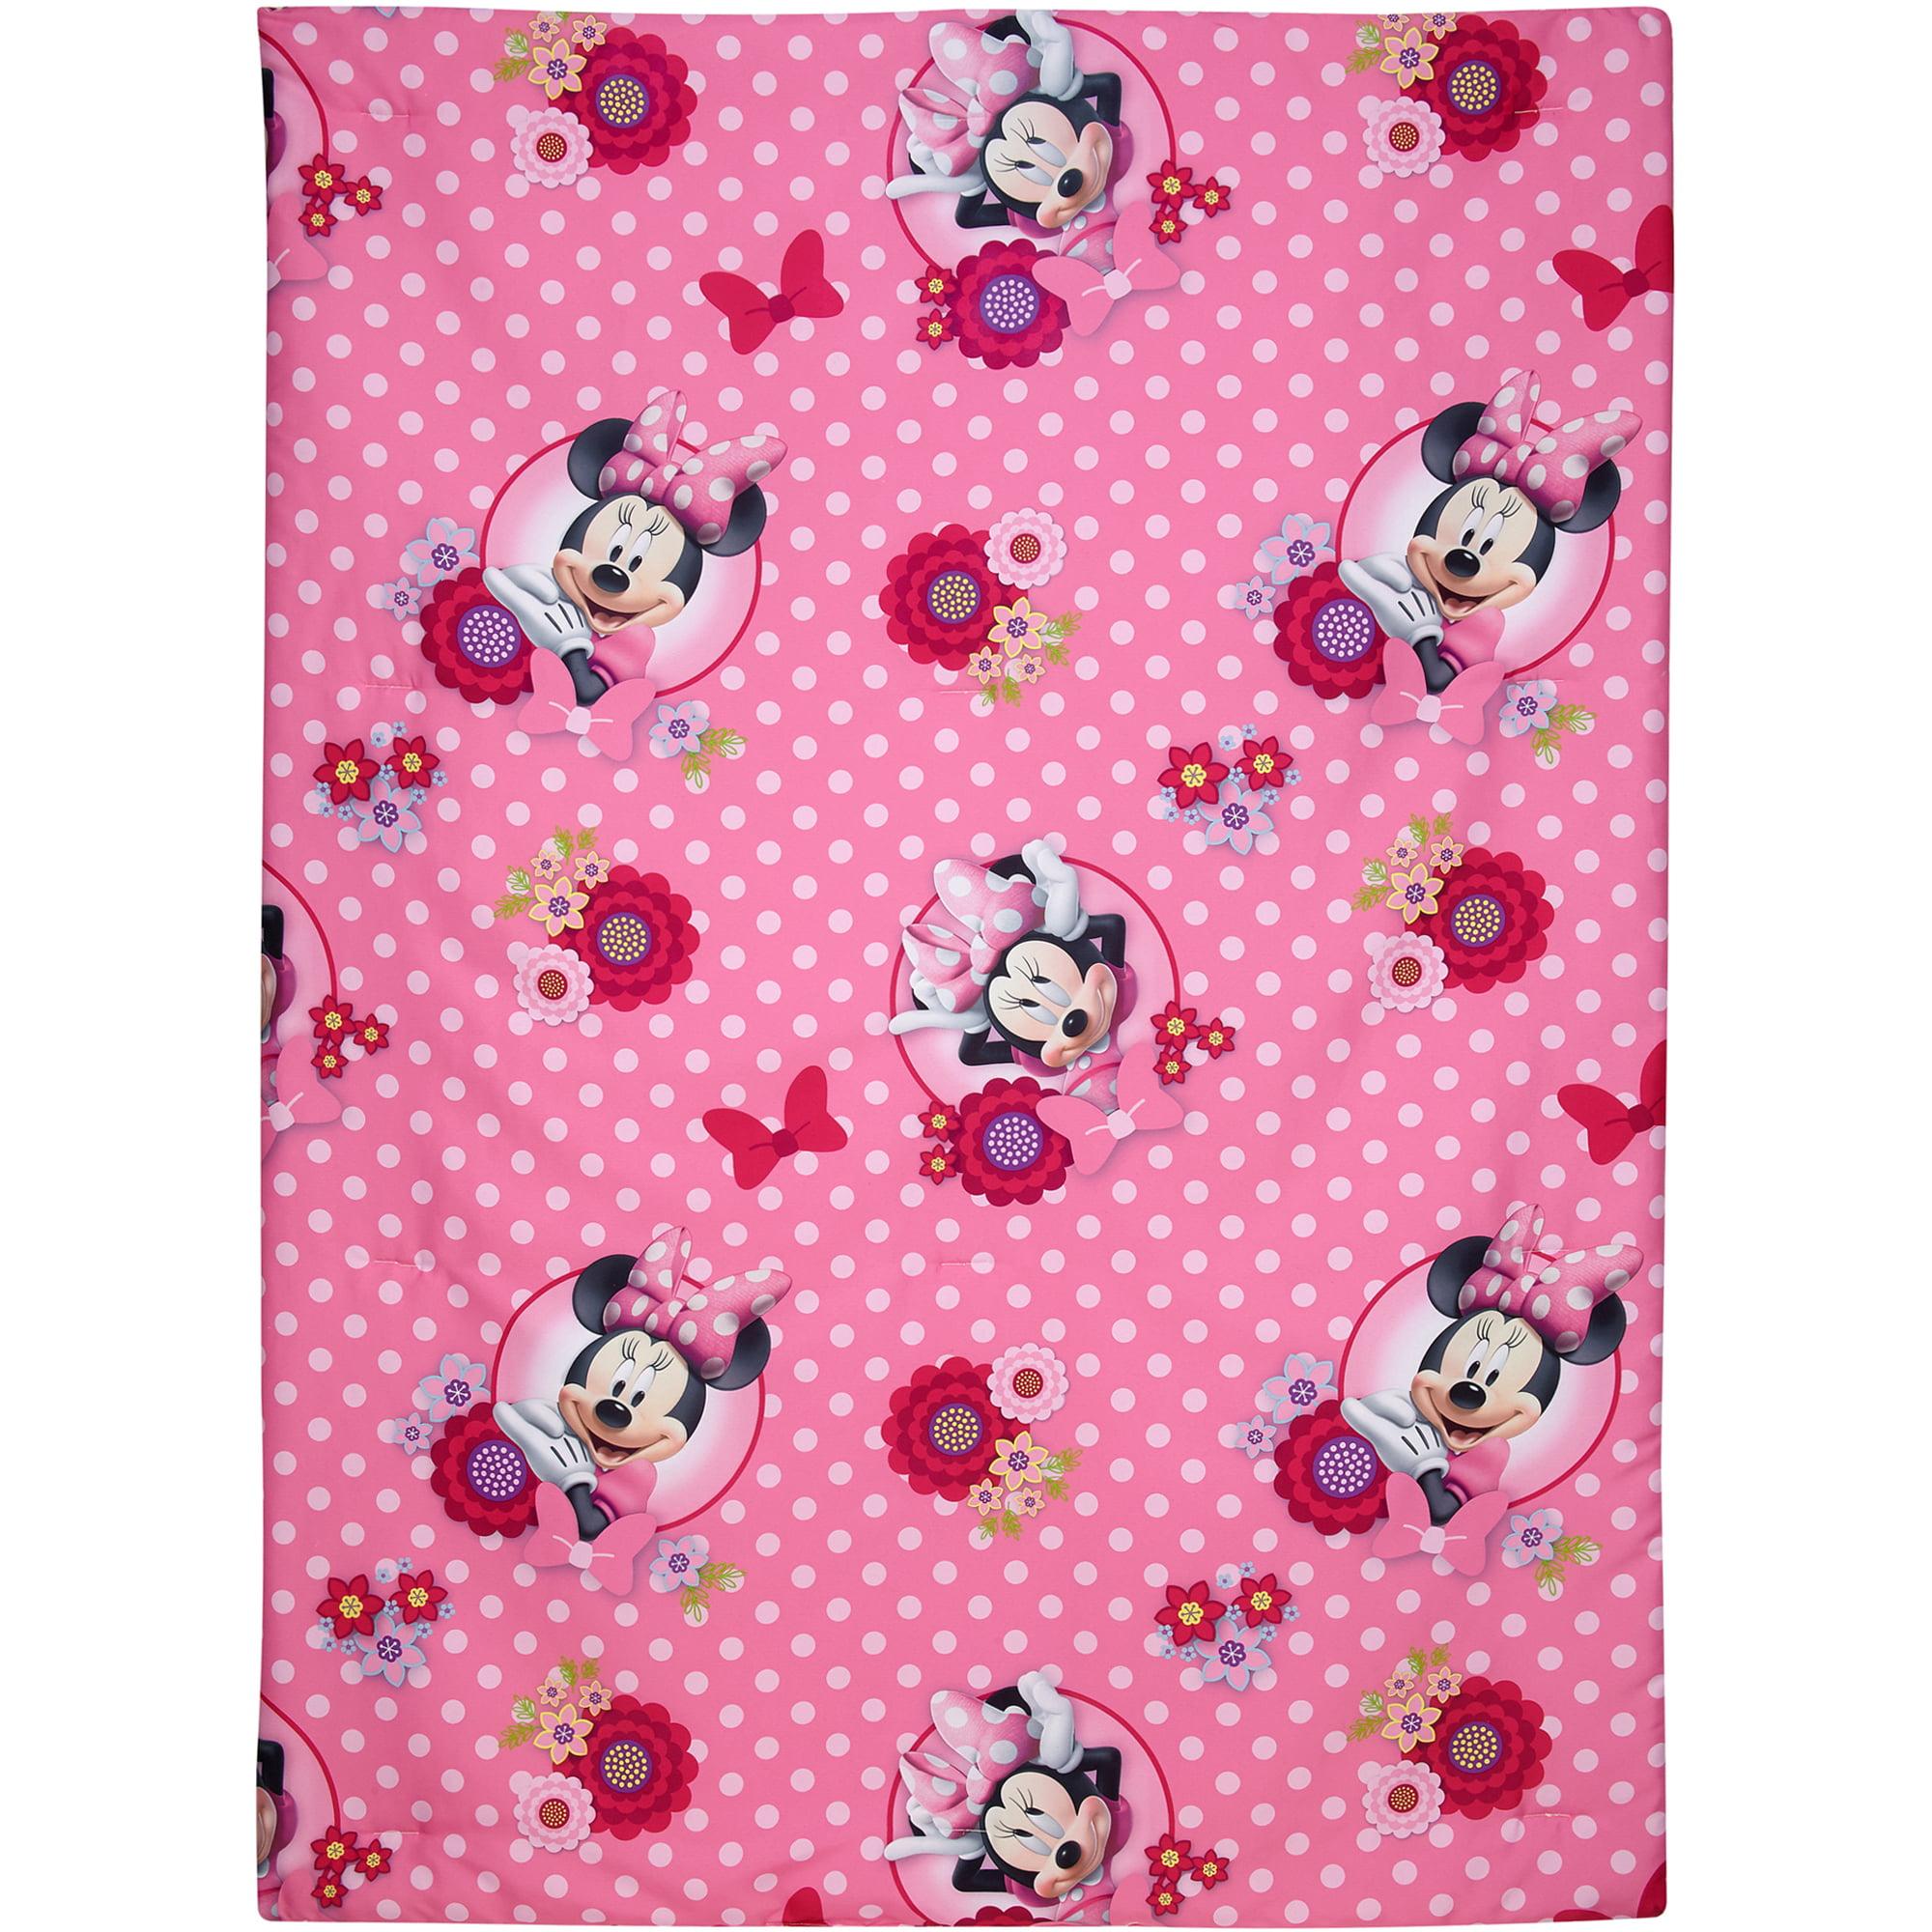 disney minnie mouse bow power 4-piece toddler bedding set